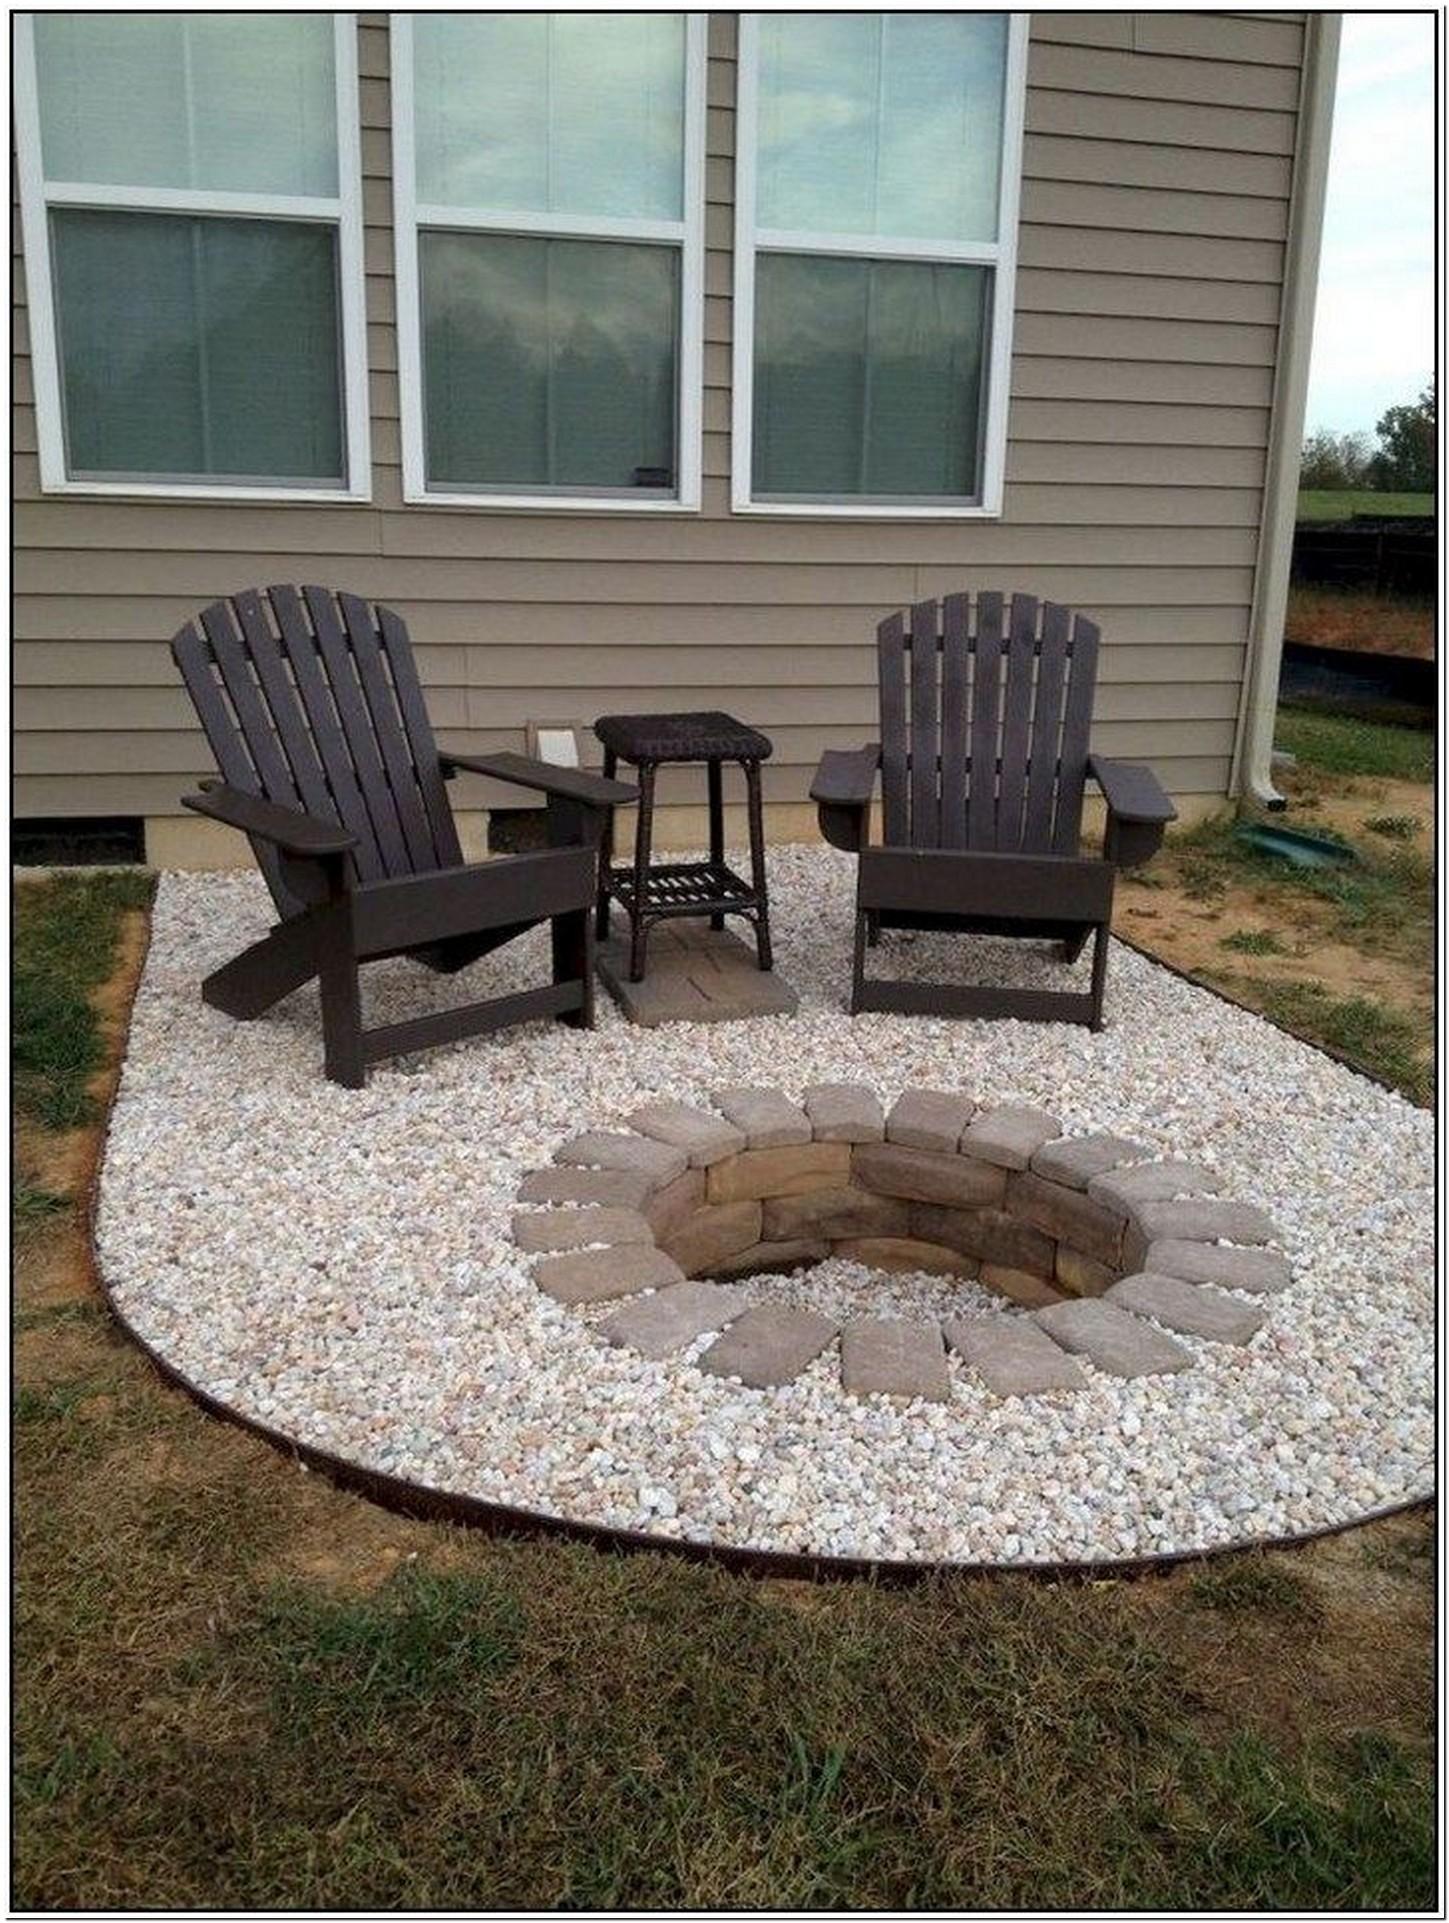 Extraordinary design ideas for a fireplace for your garden 25